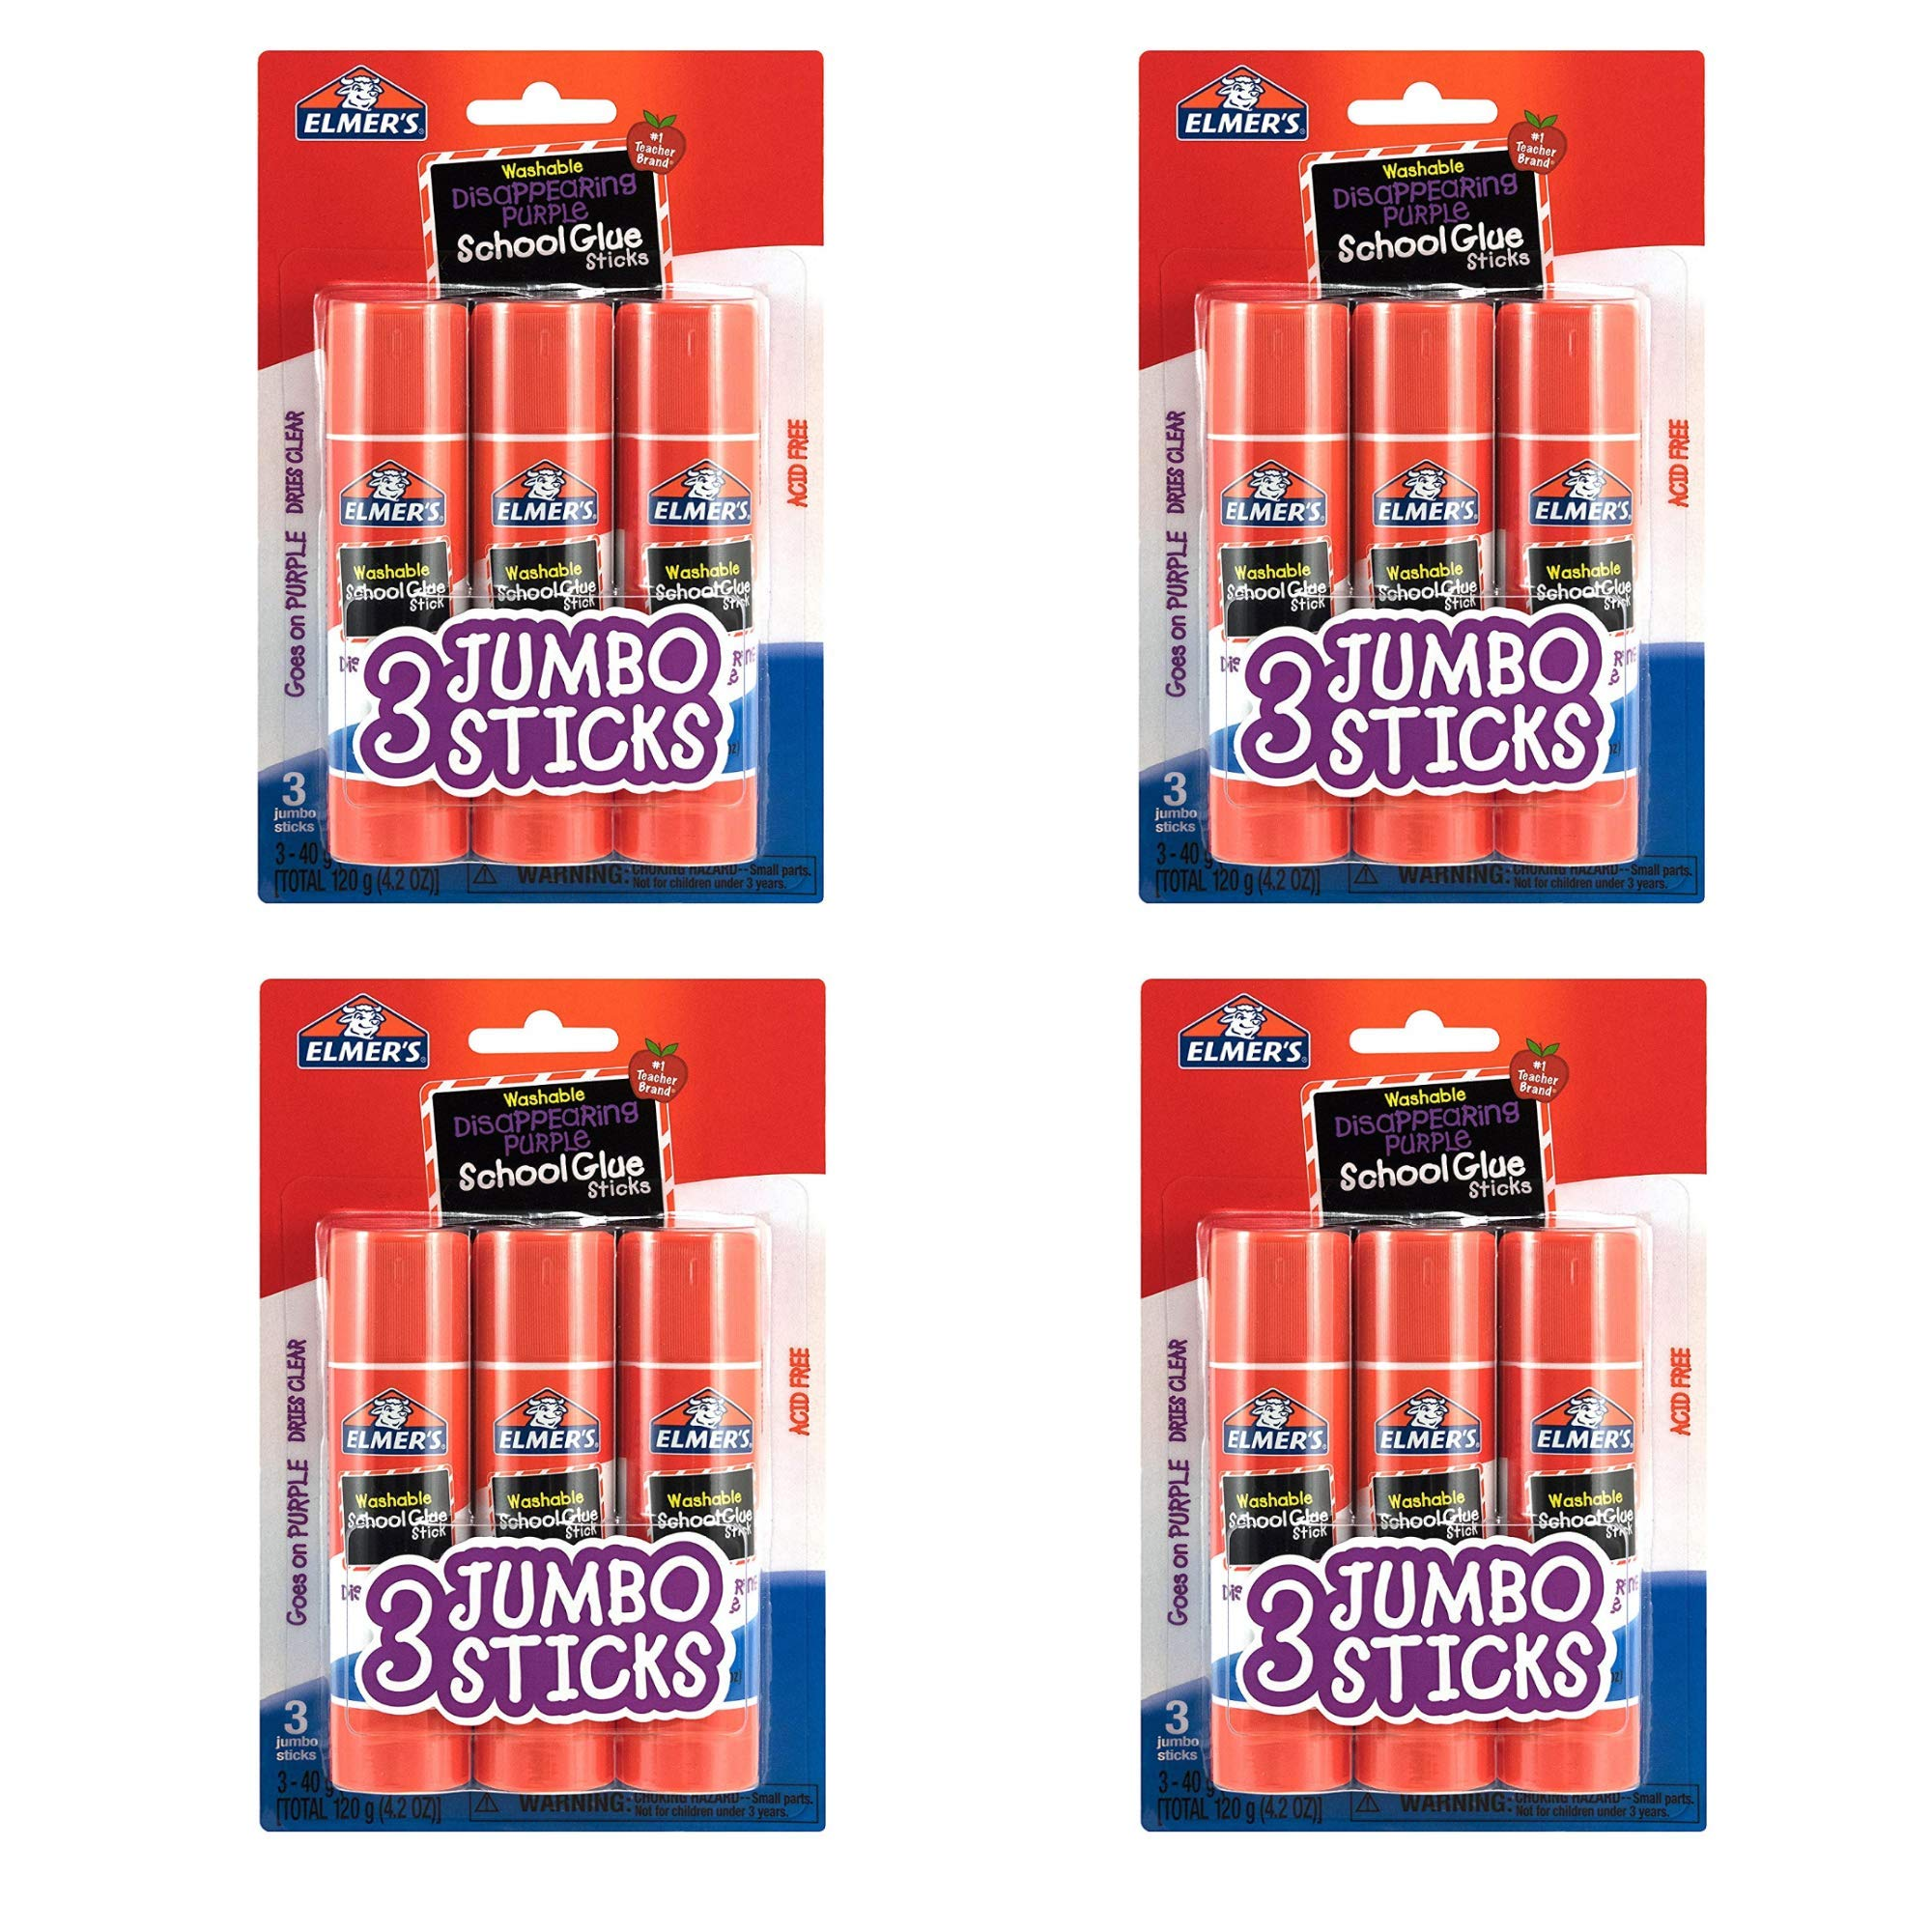 Elmers E579 Jumbo Disappearing Purple School Glue Stick, 1.4 Ounce, 4 Packs of 3 Sticks, 12 Sticks Total